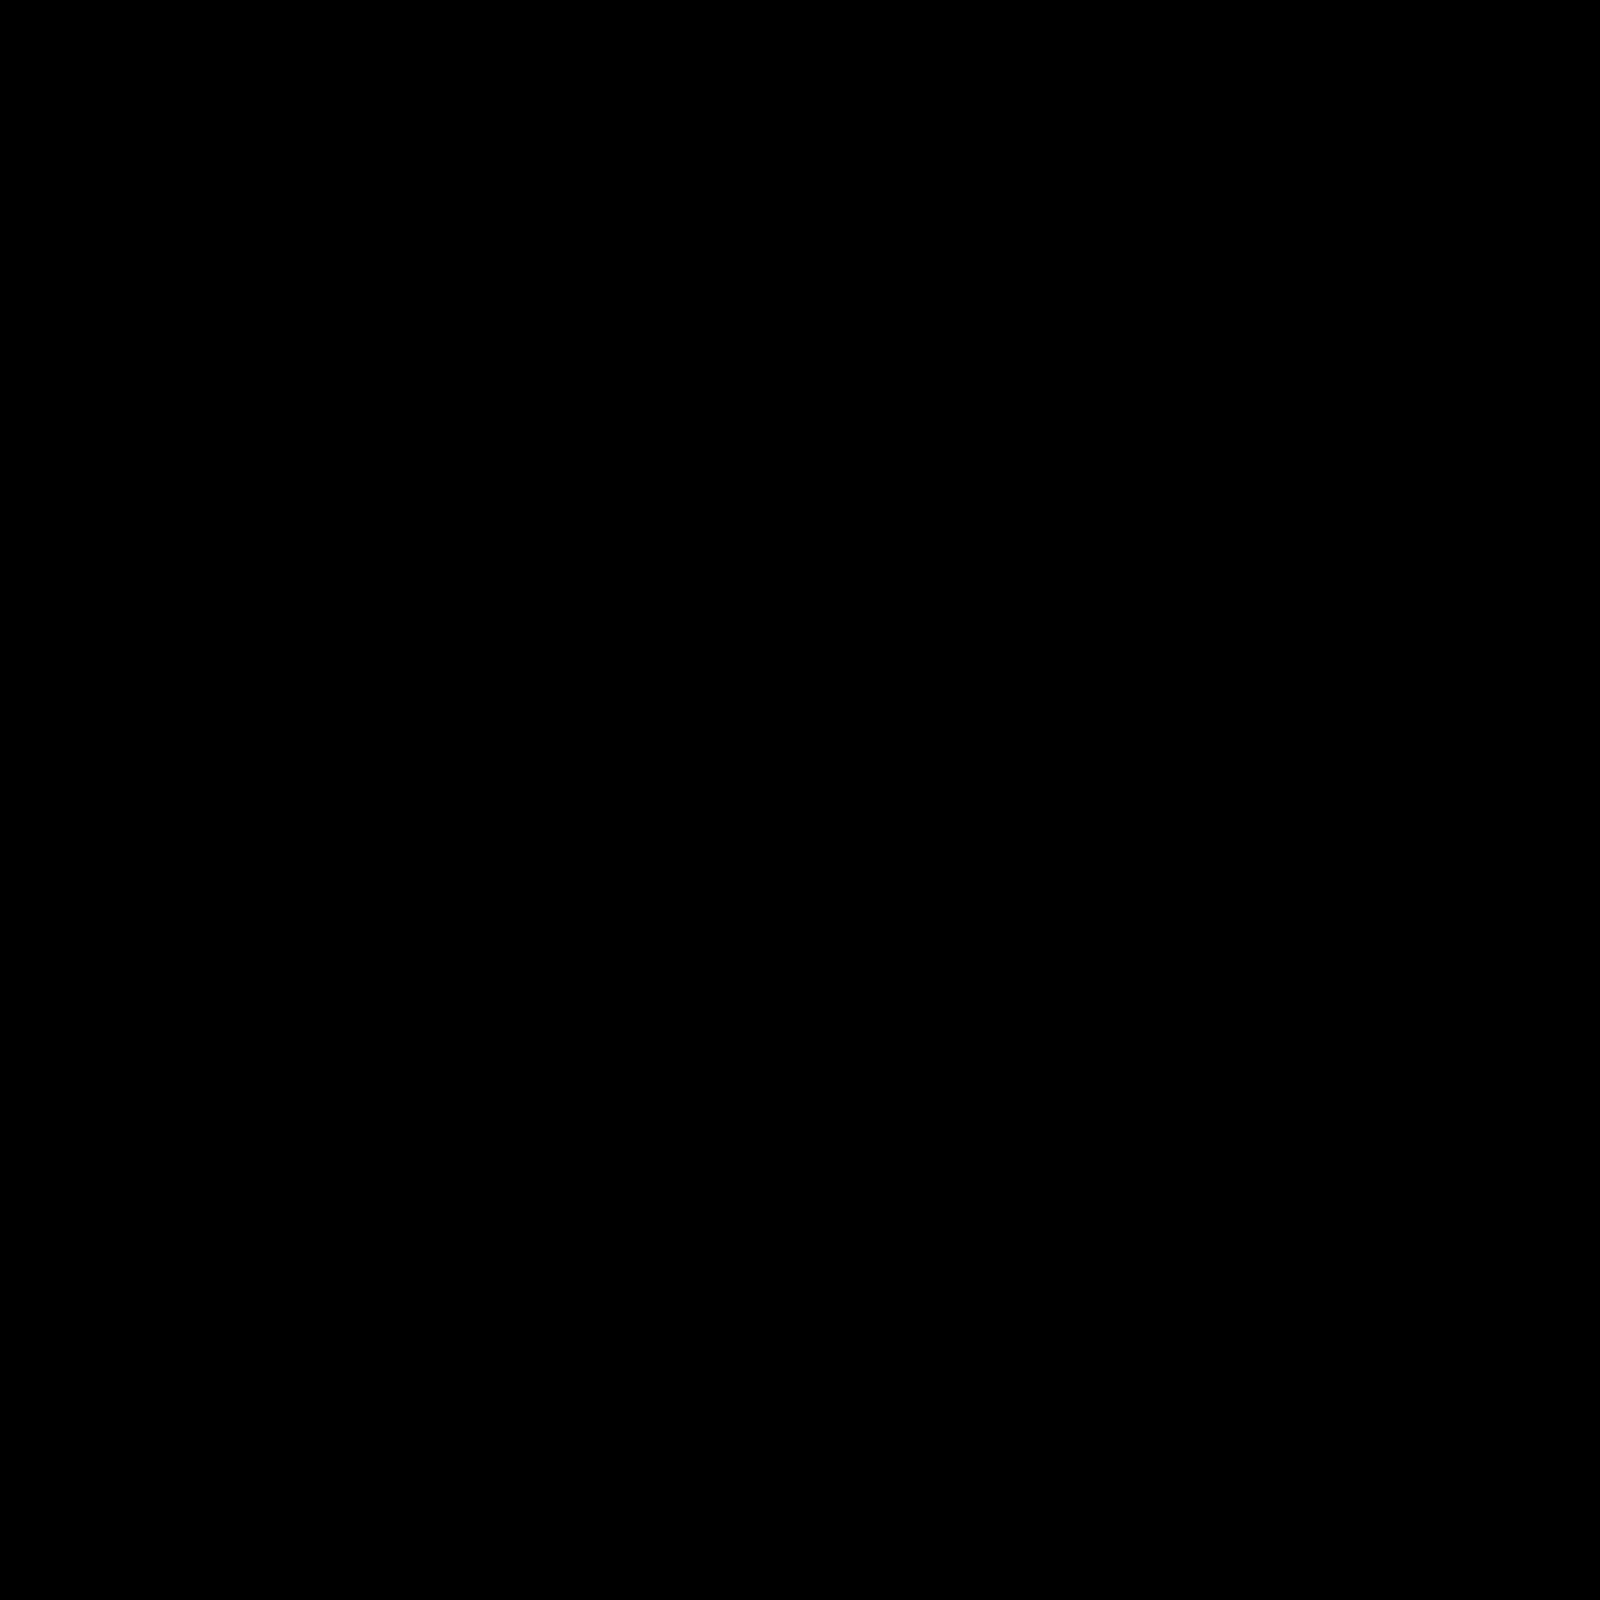 Yoga Filled icon